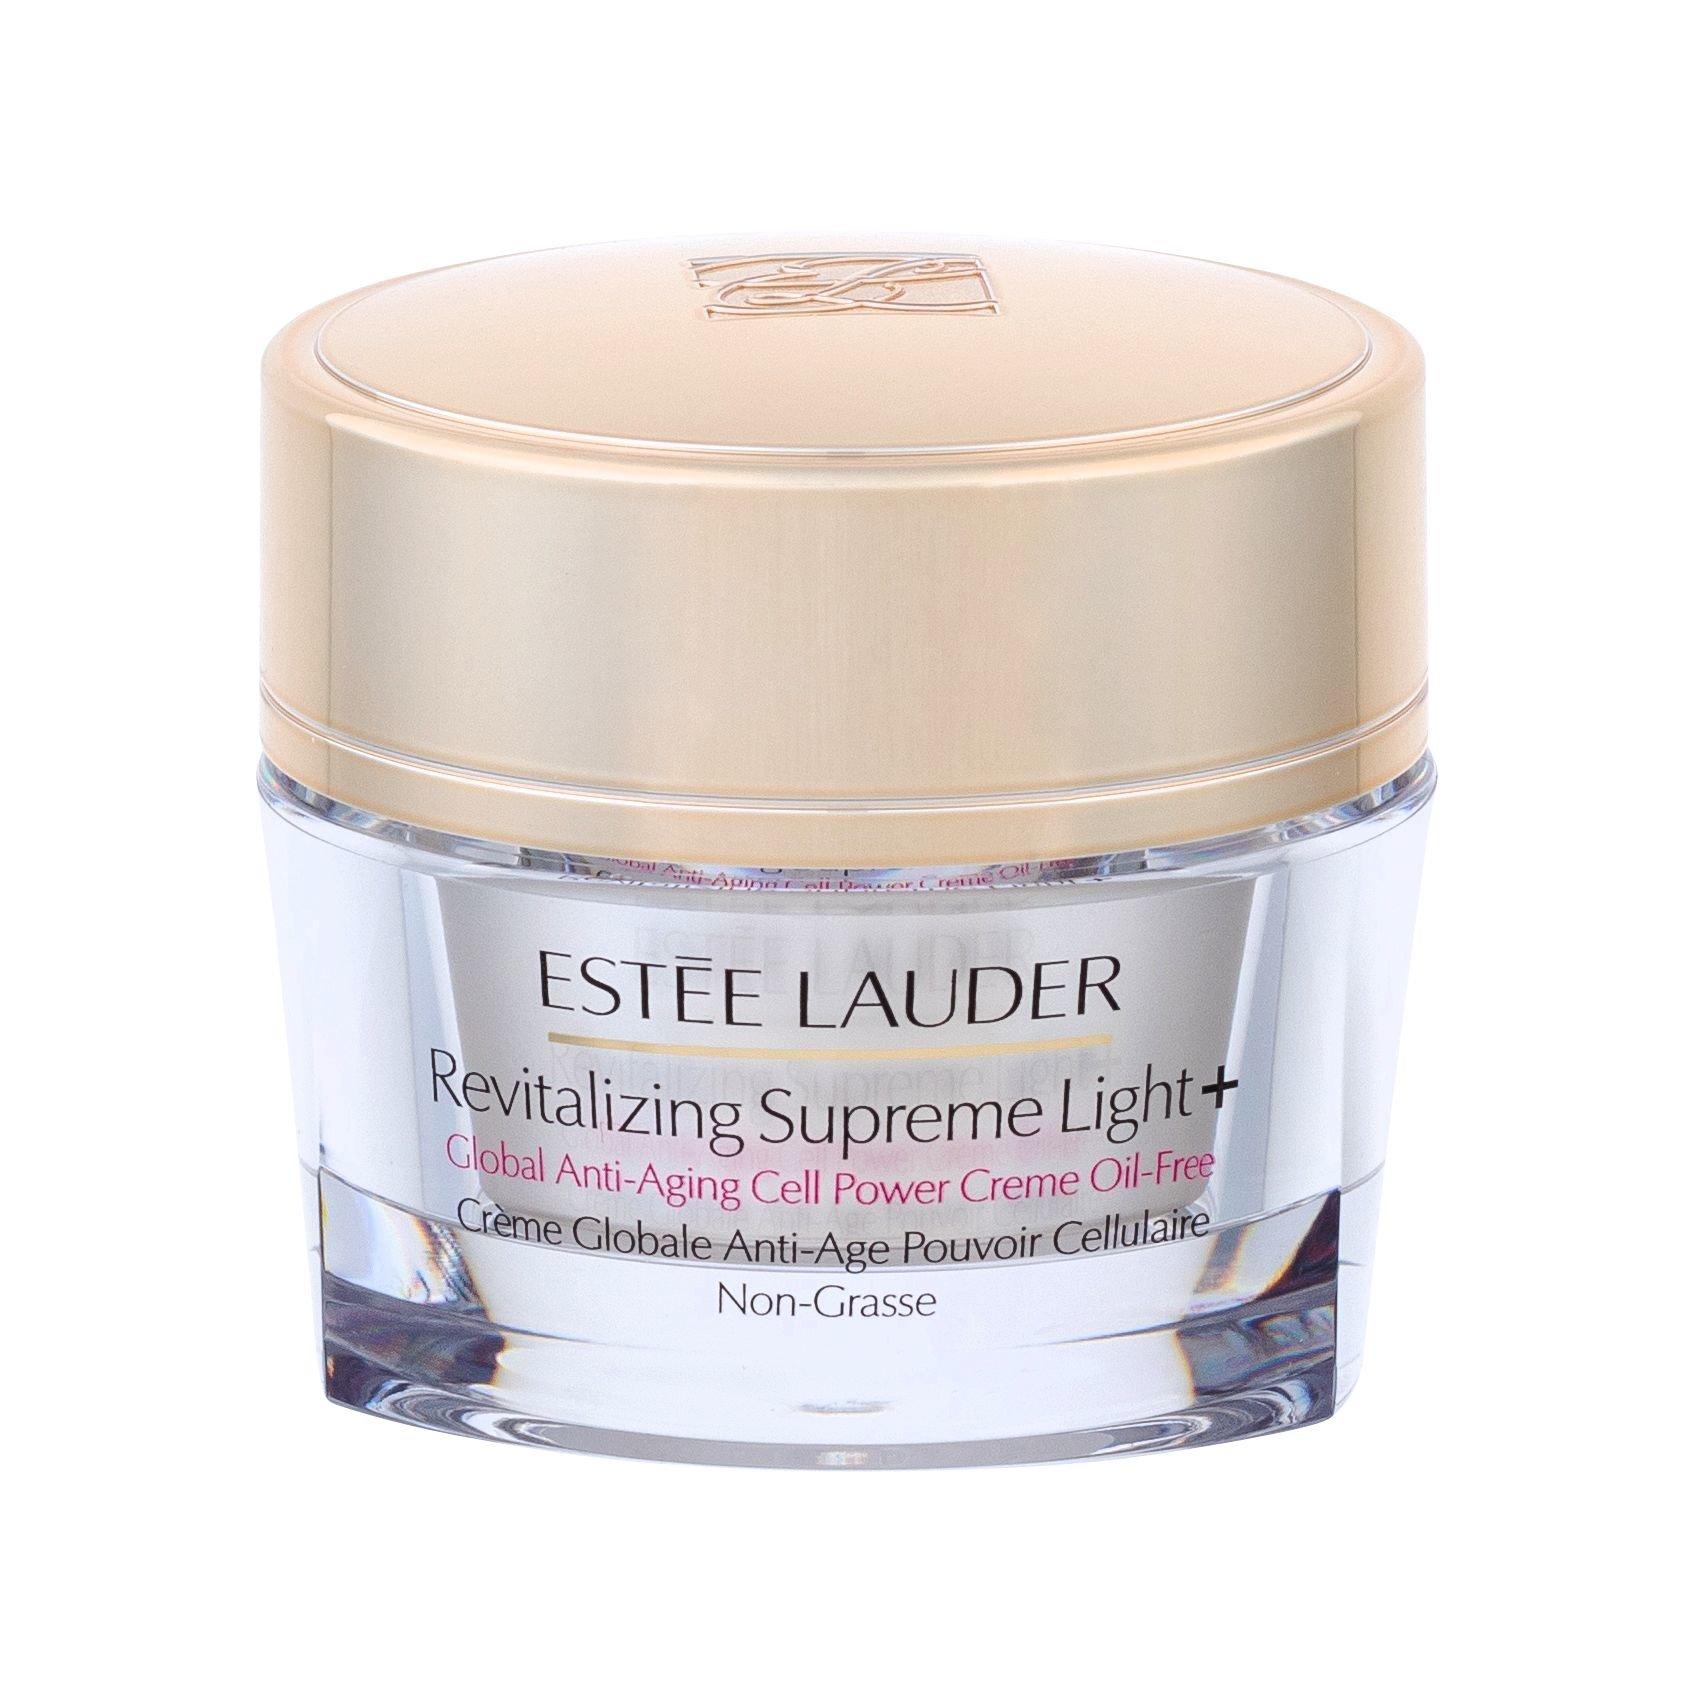 Estée Lauder Revitalizing Supreme Light+ Cosmetic 30ml